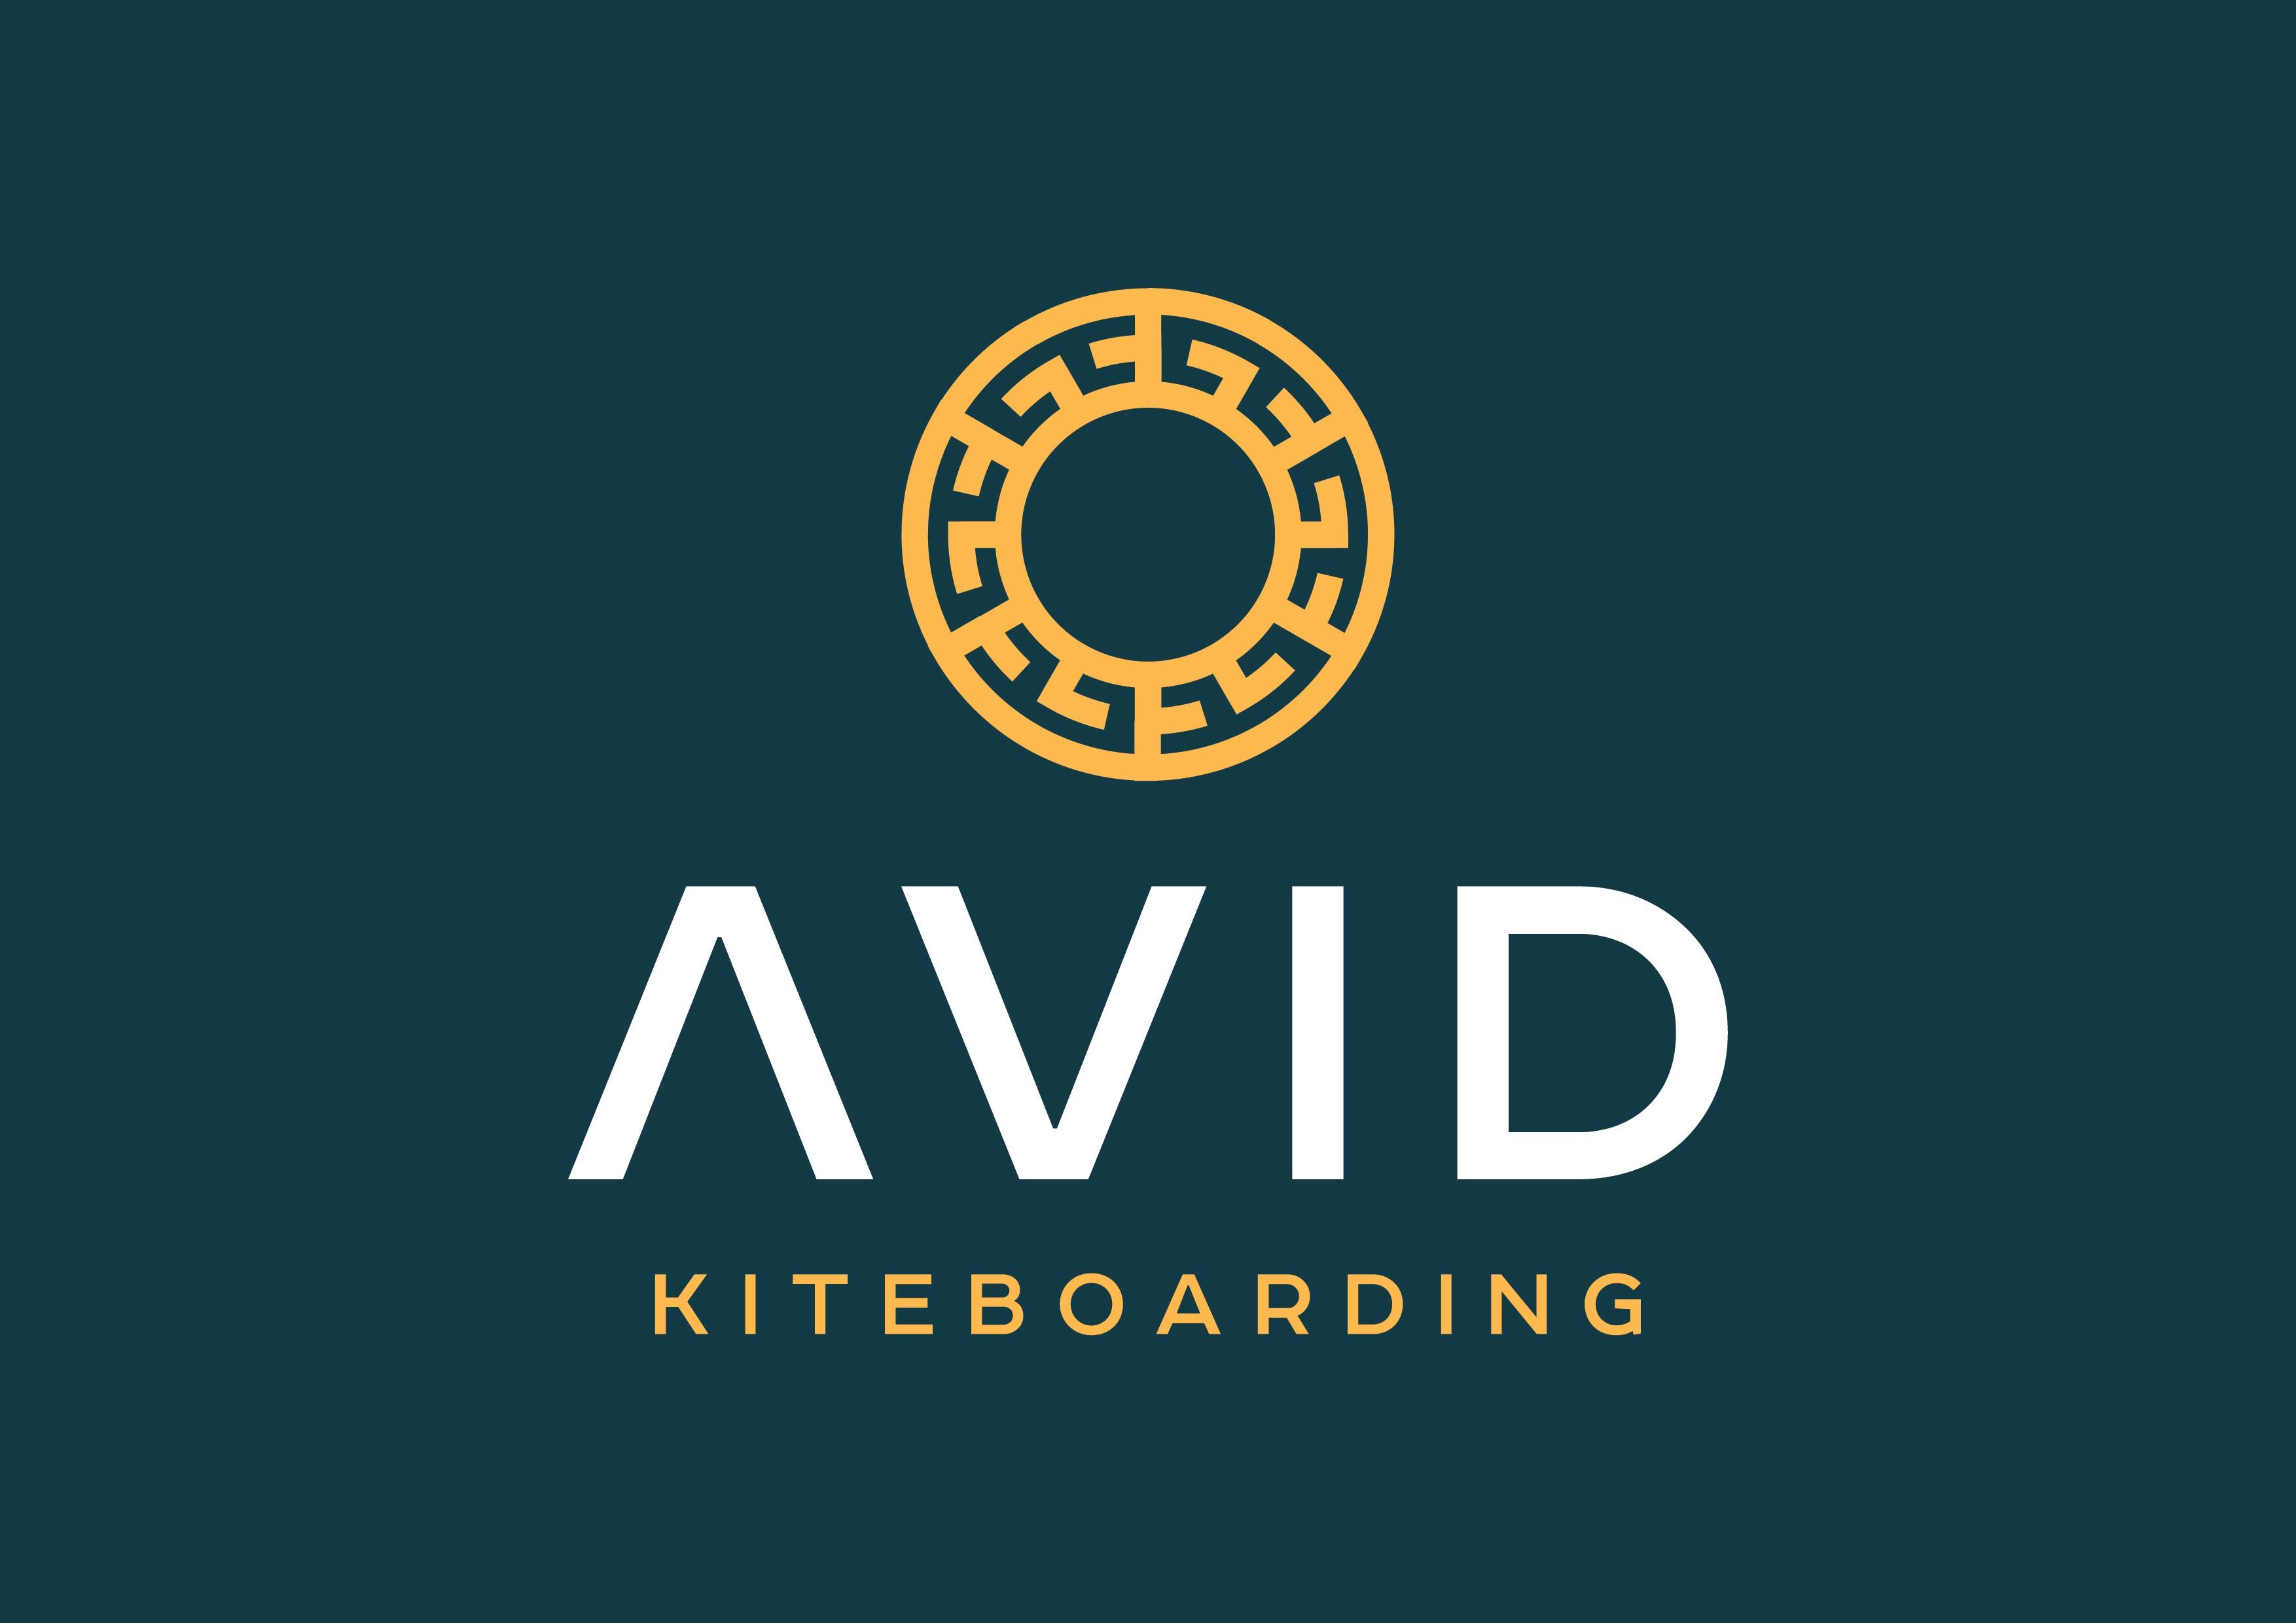 design a great logo for avid kitesurfing